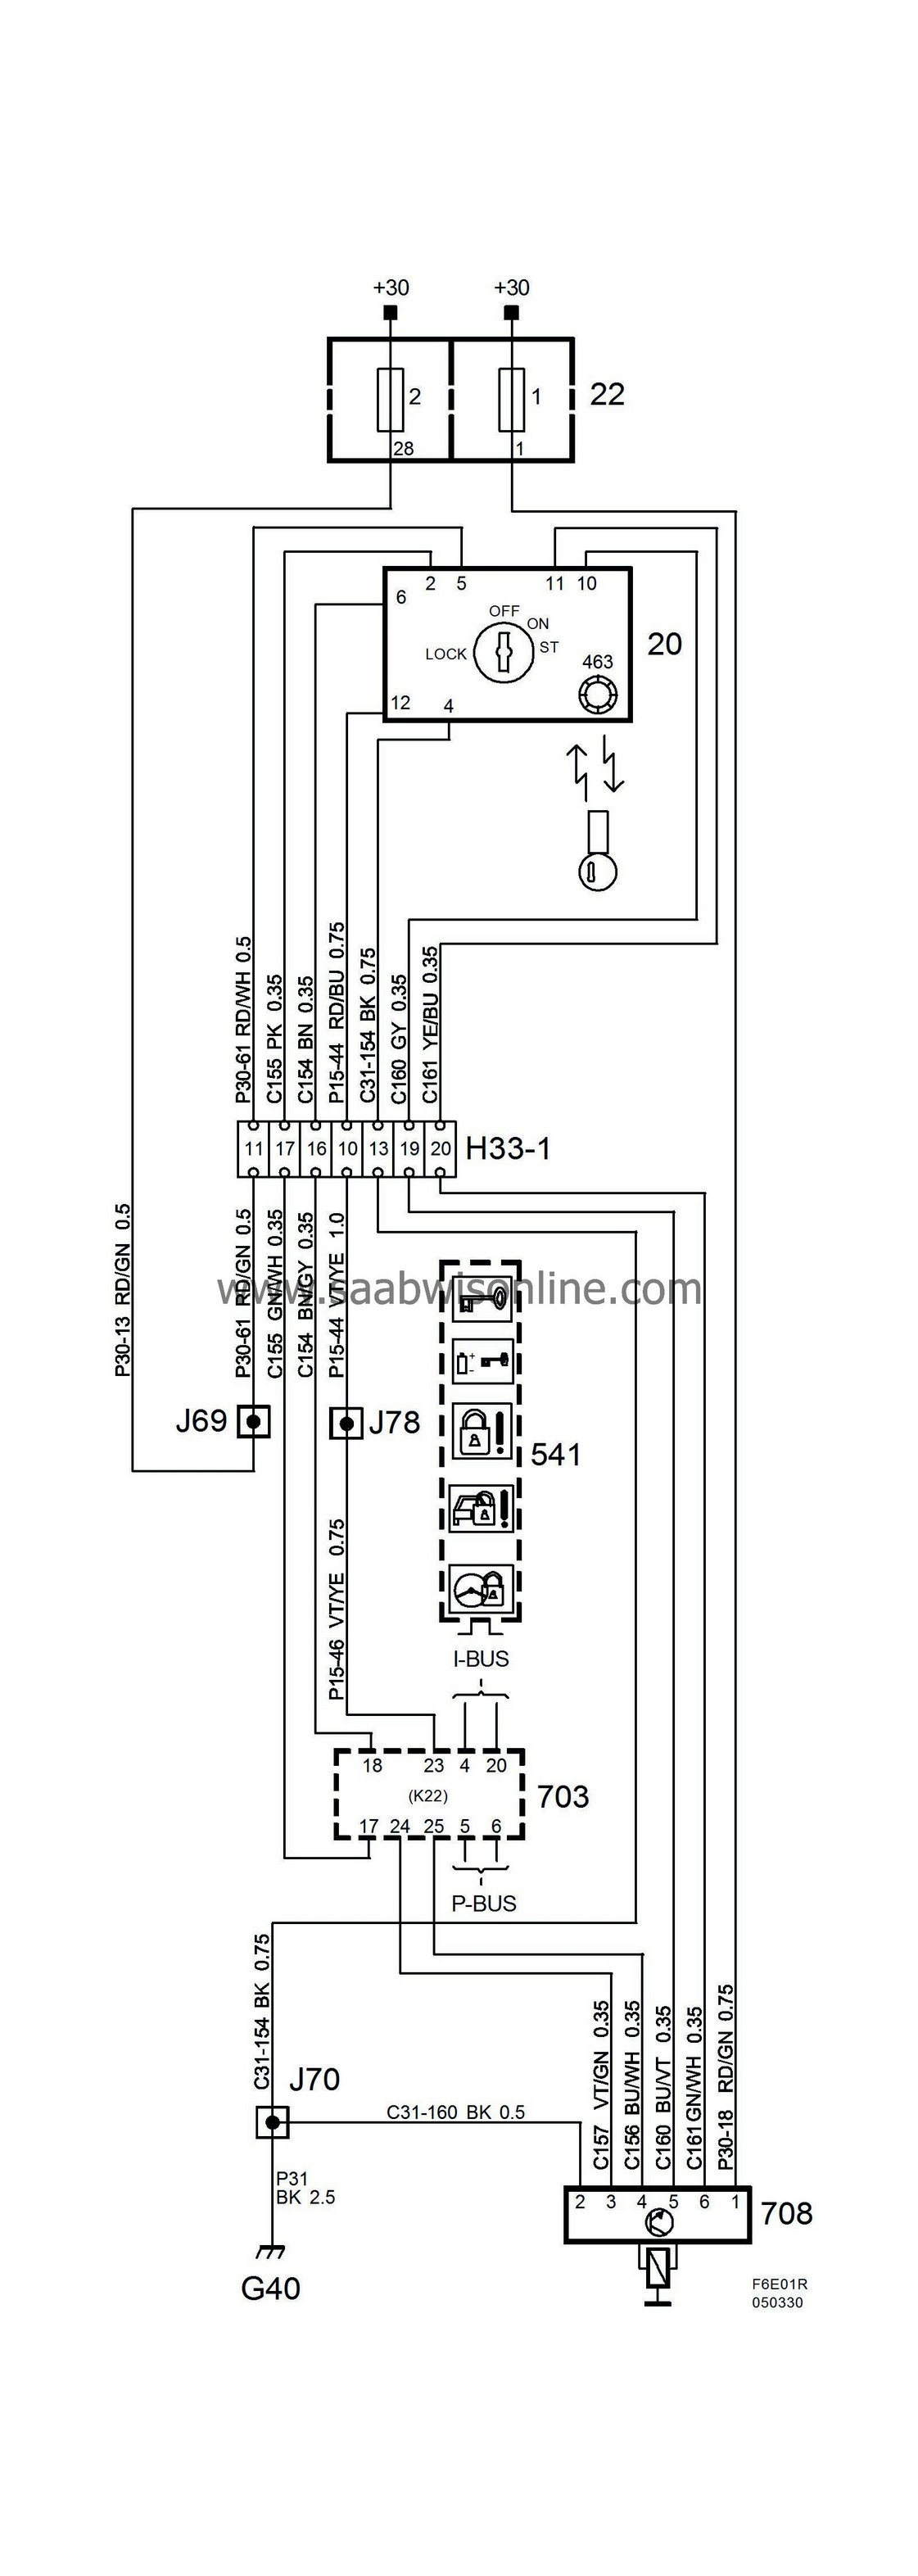 wiring diagram for saab 9 3 ignition | wiring diagram 179 cap  avemarisstella.it